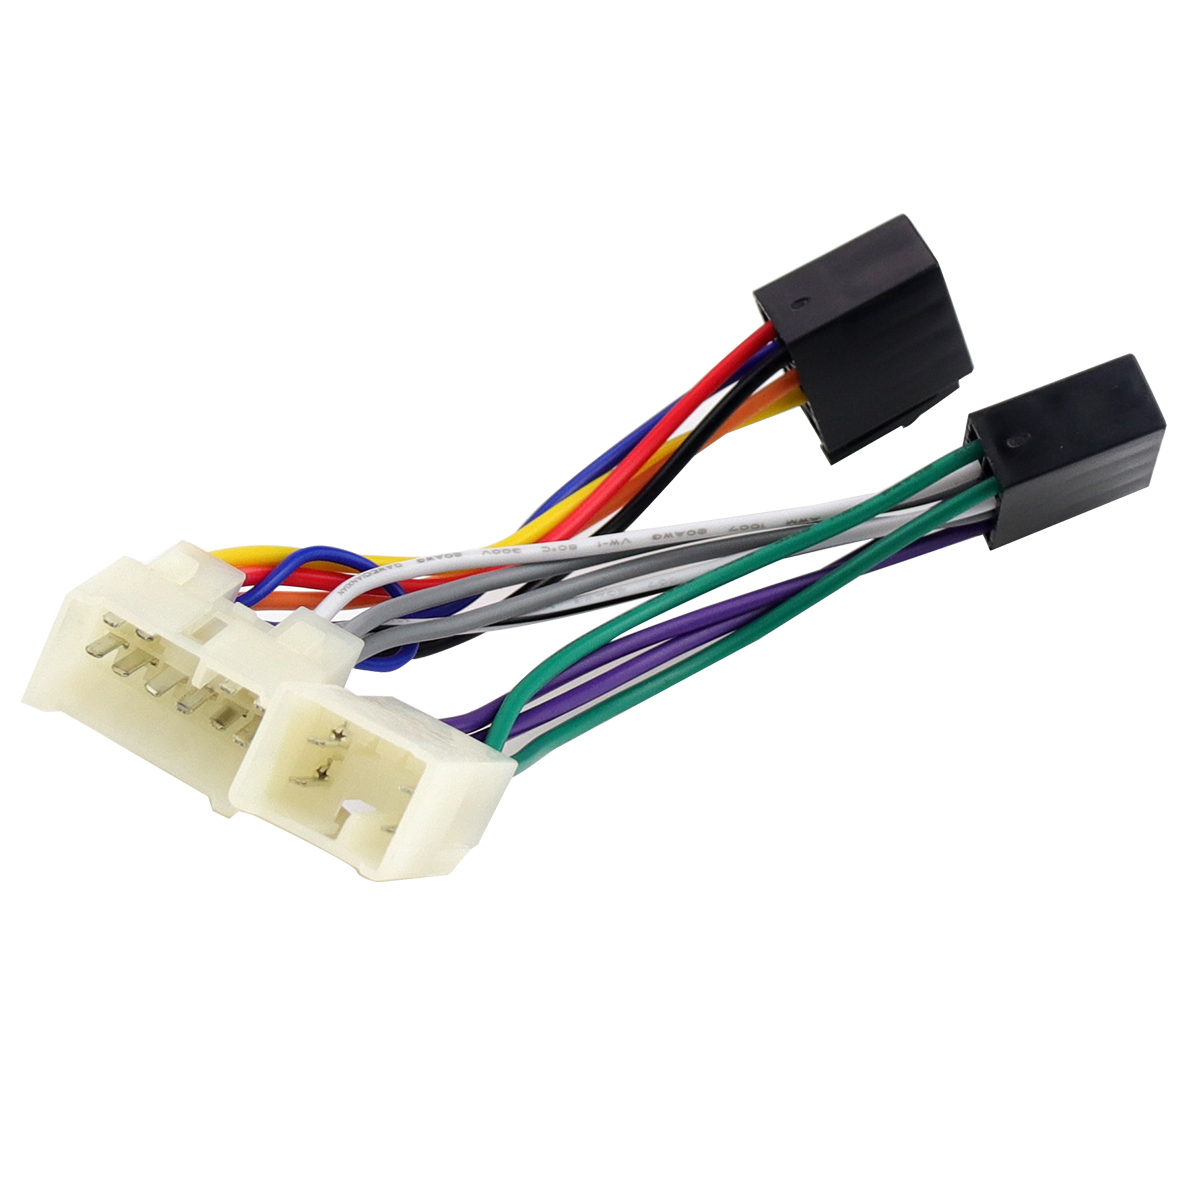 medium resolution of iso wiring harness adapter plug cable for toyota rav4 solara yaris lexus mr2 for car radio multimedia adaptor sockets connector